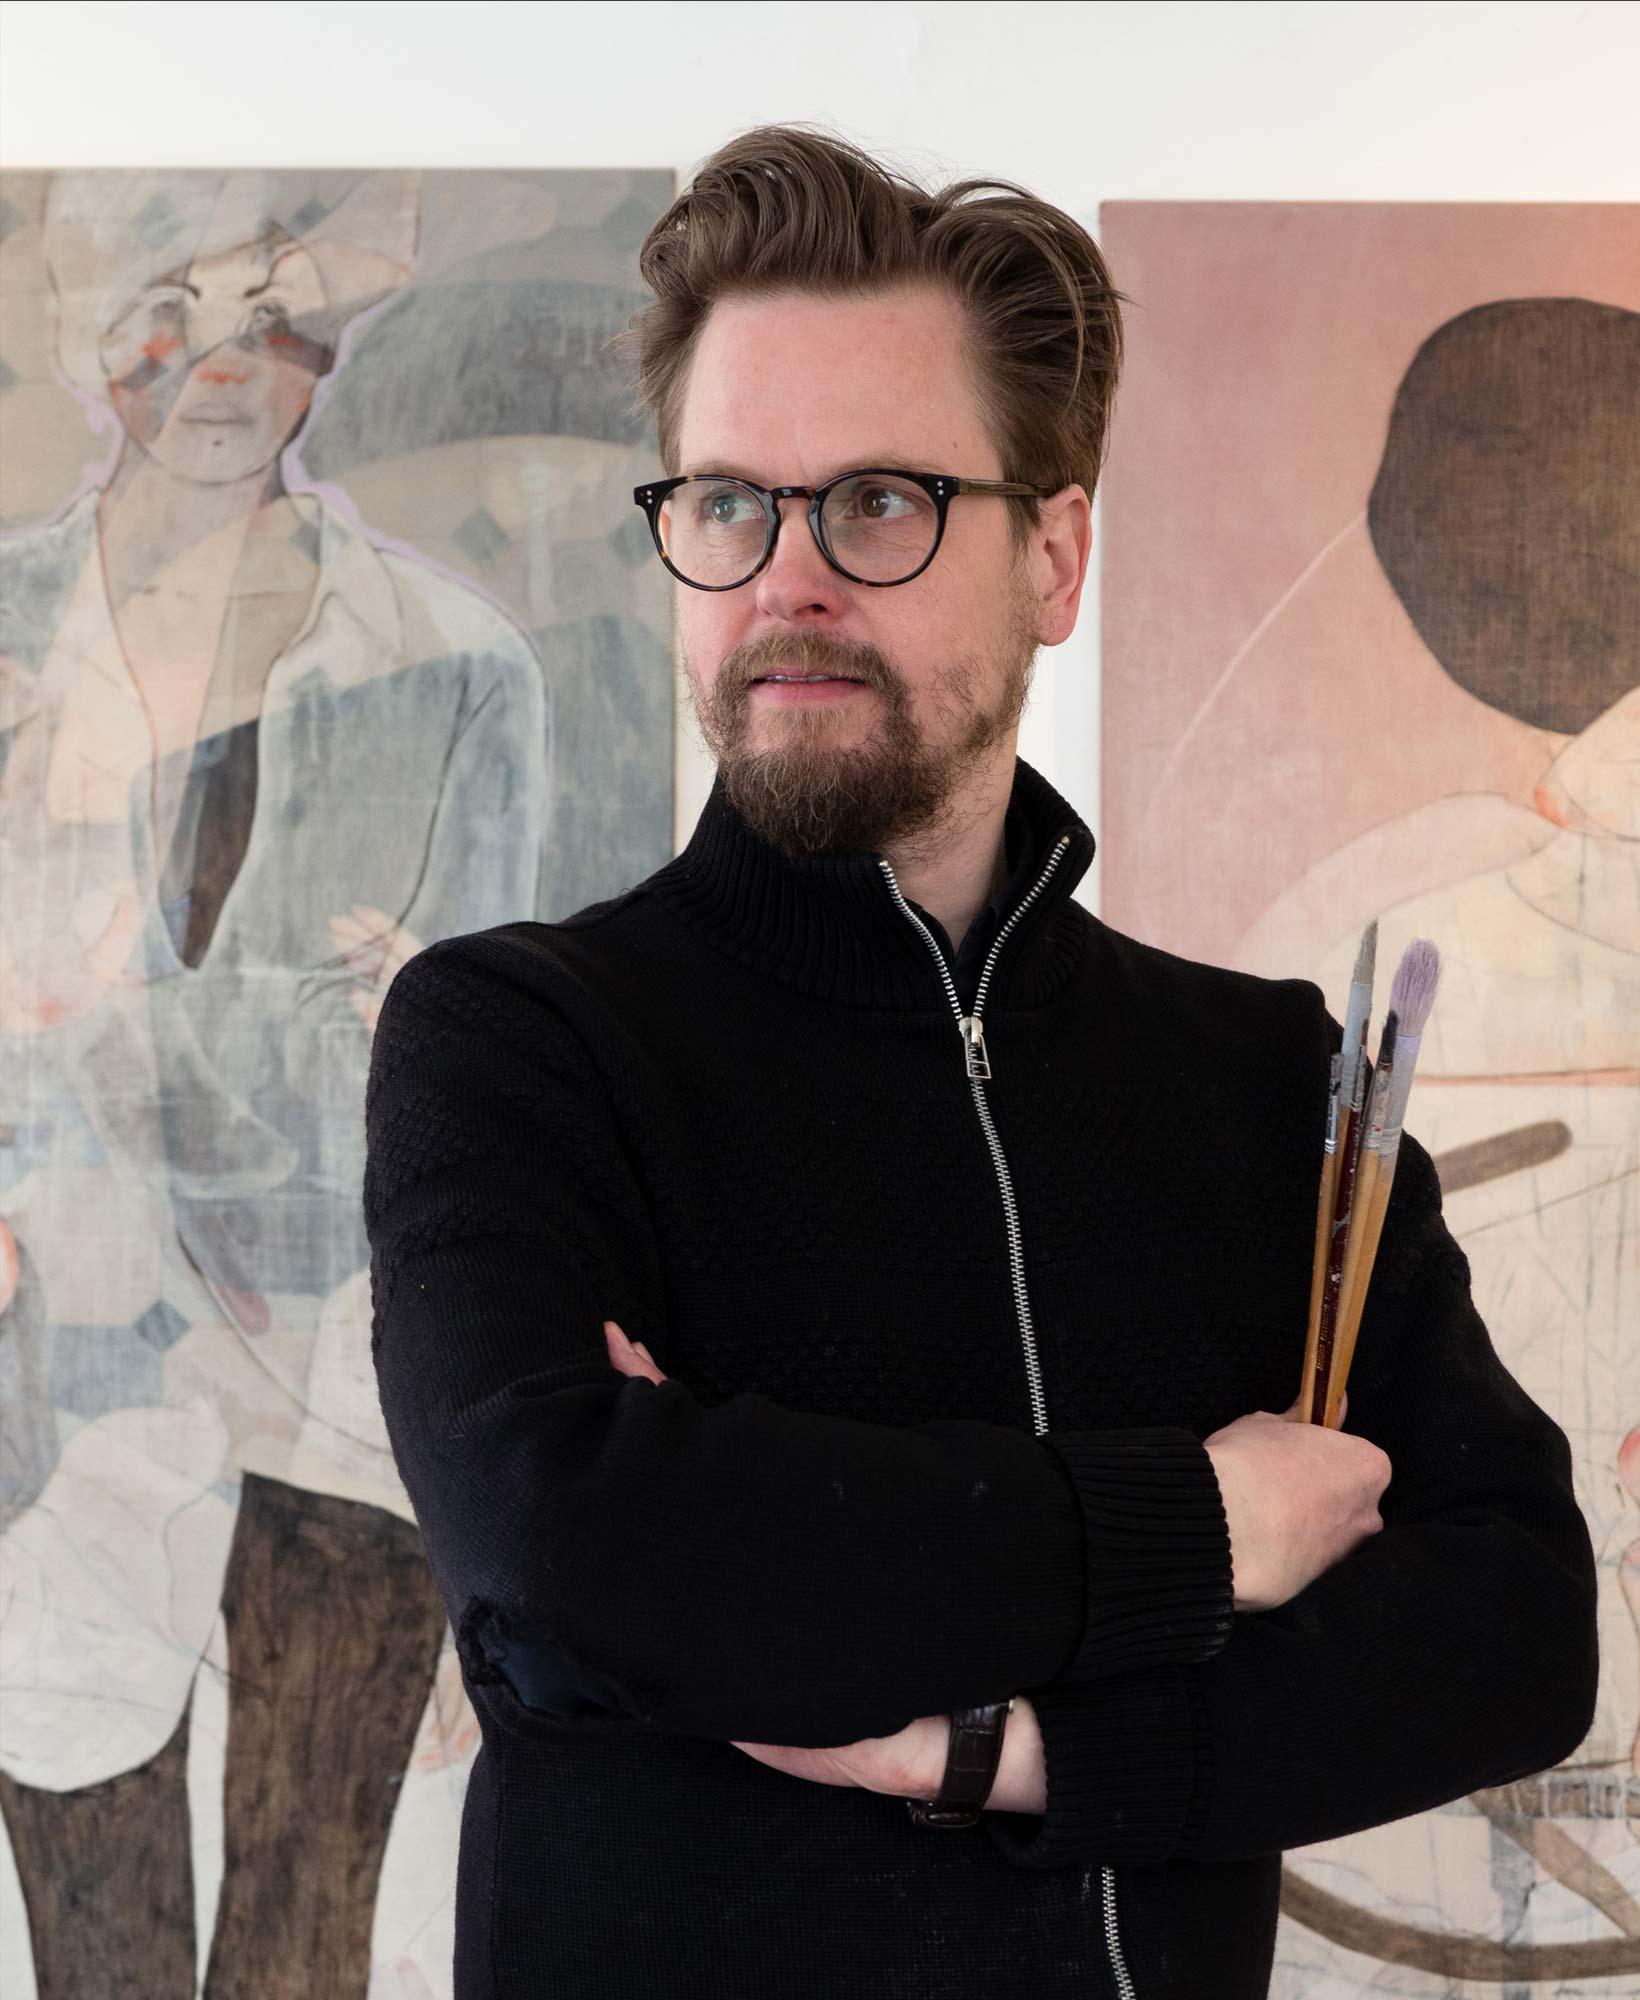 Andre Lundquist portrait